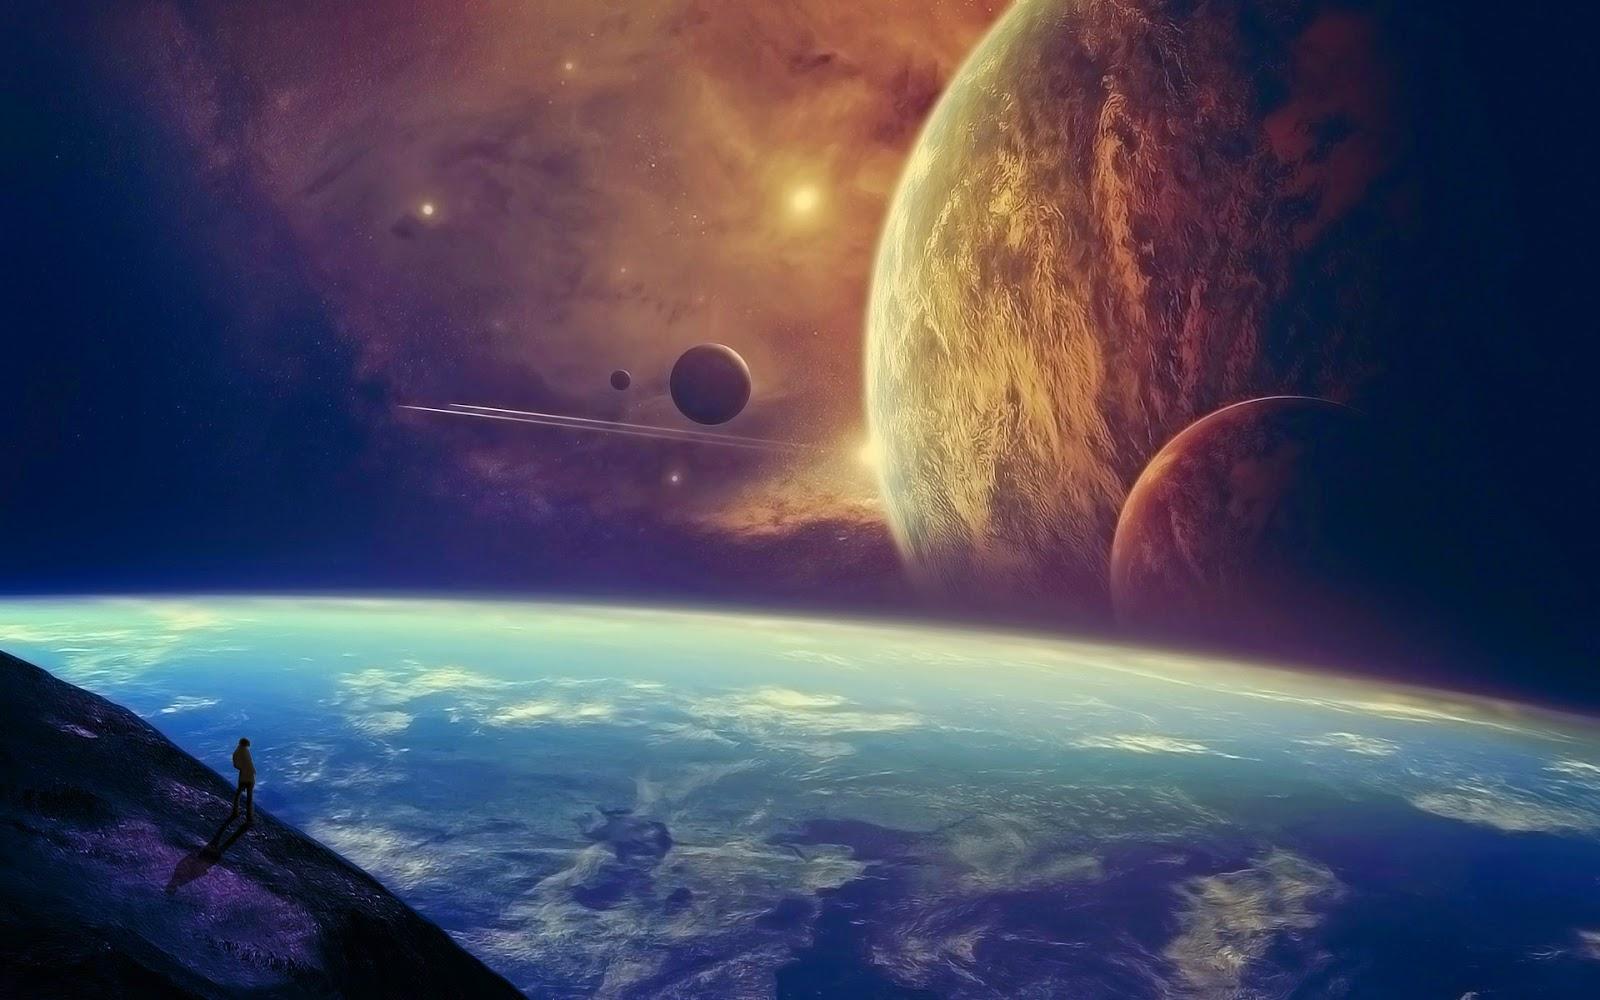 Papel de Parede Ficção Científica para pc hd 3d grátis Sci Fi desktop hd wallpaper image free